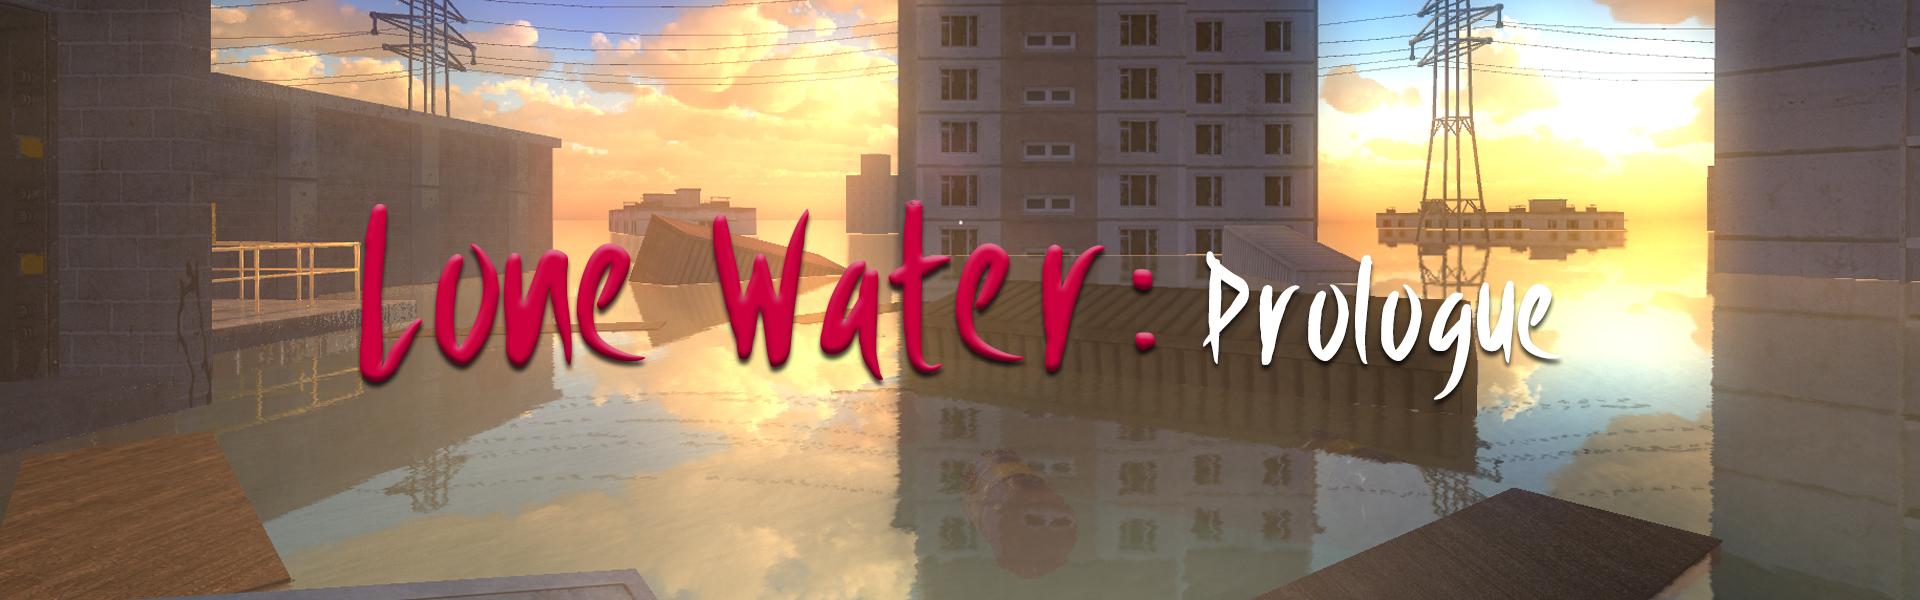 Lone Water: Prologue